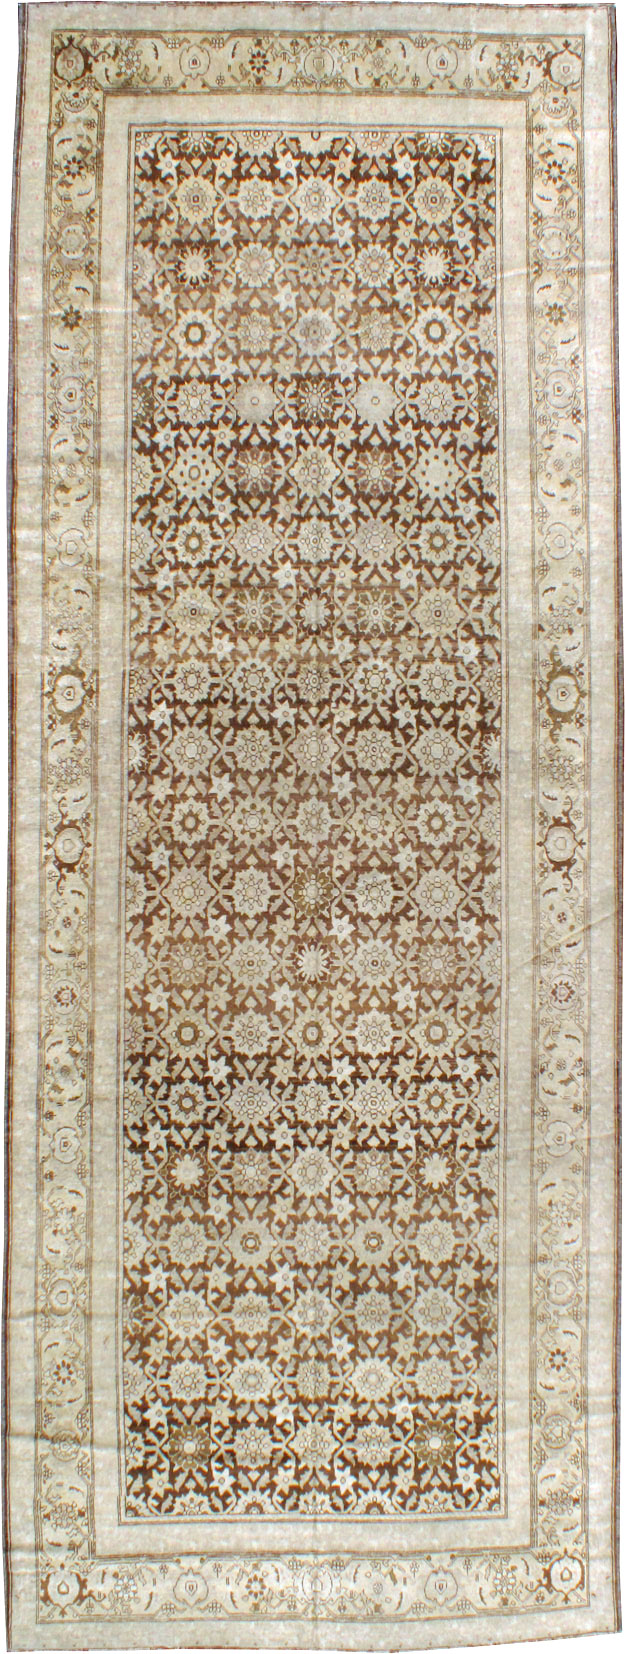 Antique Caucasian Karabagh Gallery Carpet, No.11751 - Galerie Shabab